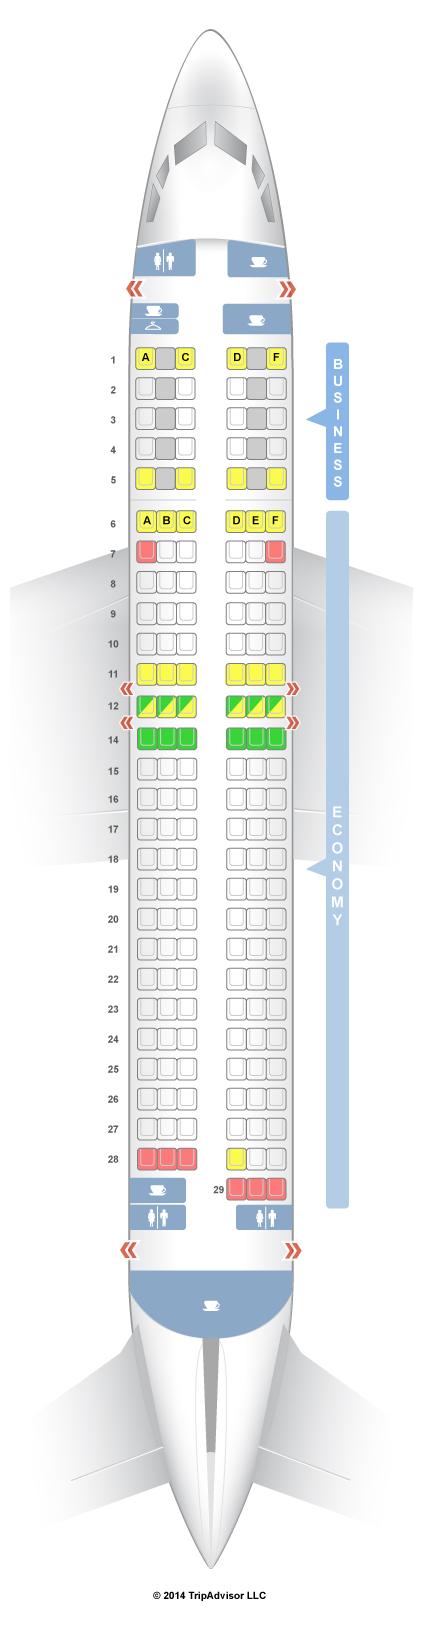 Боинг 787 схема салоне